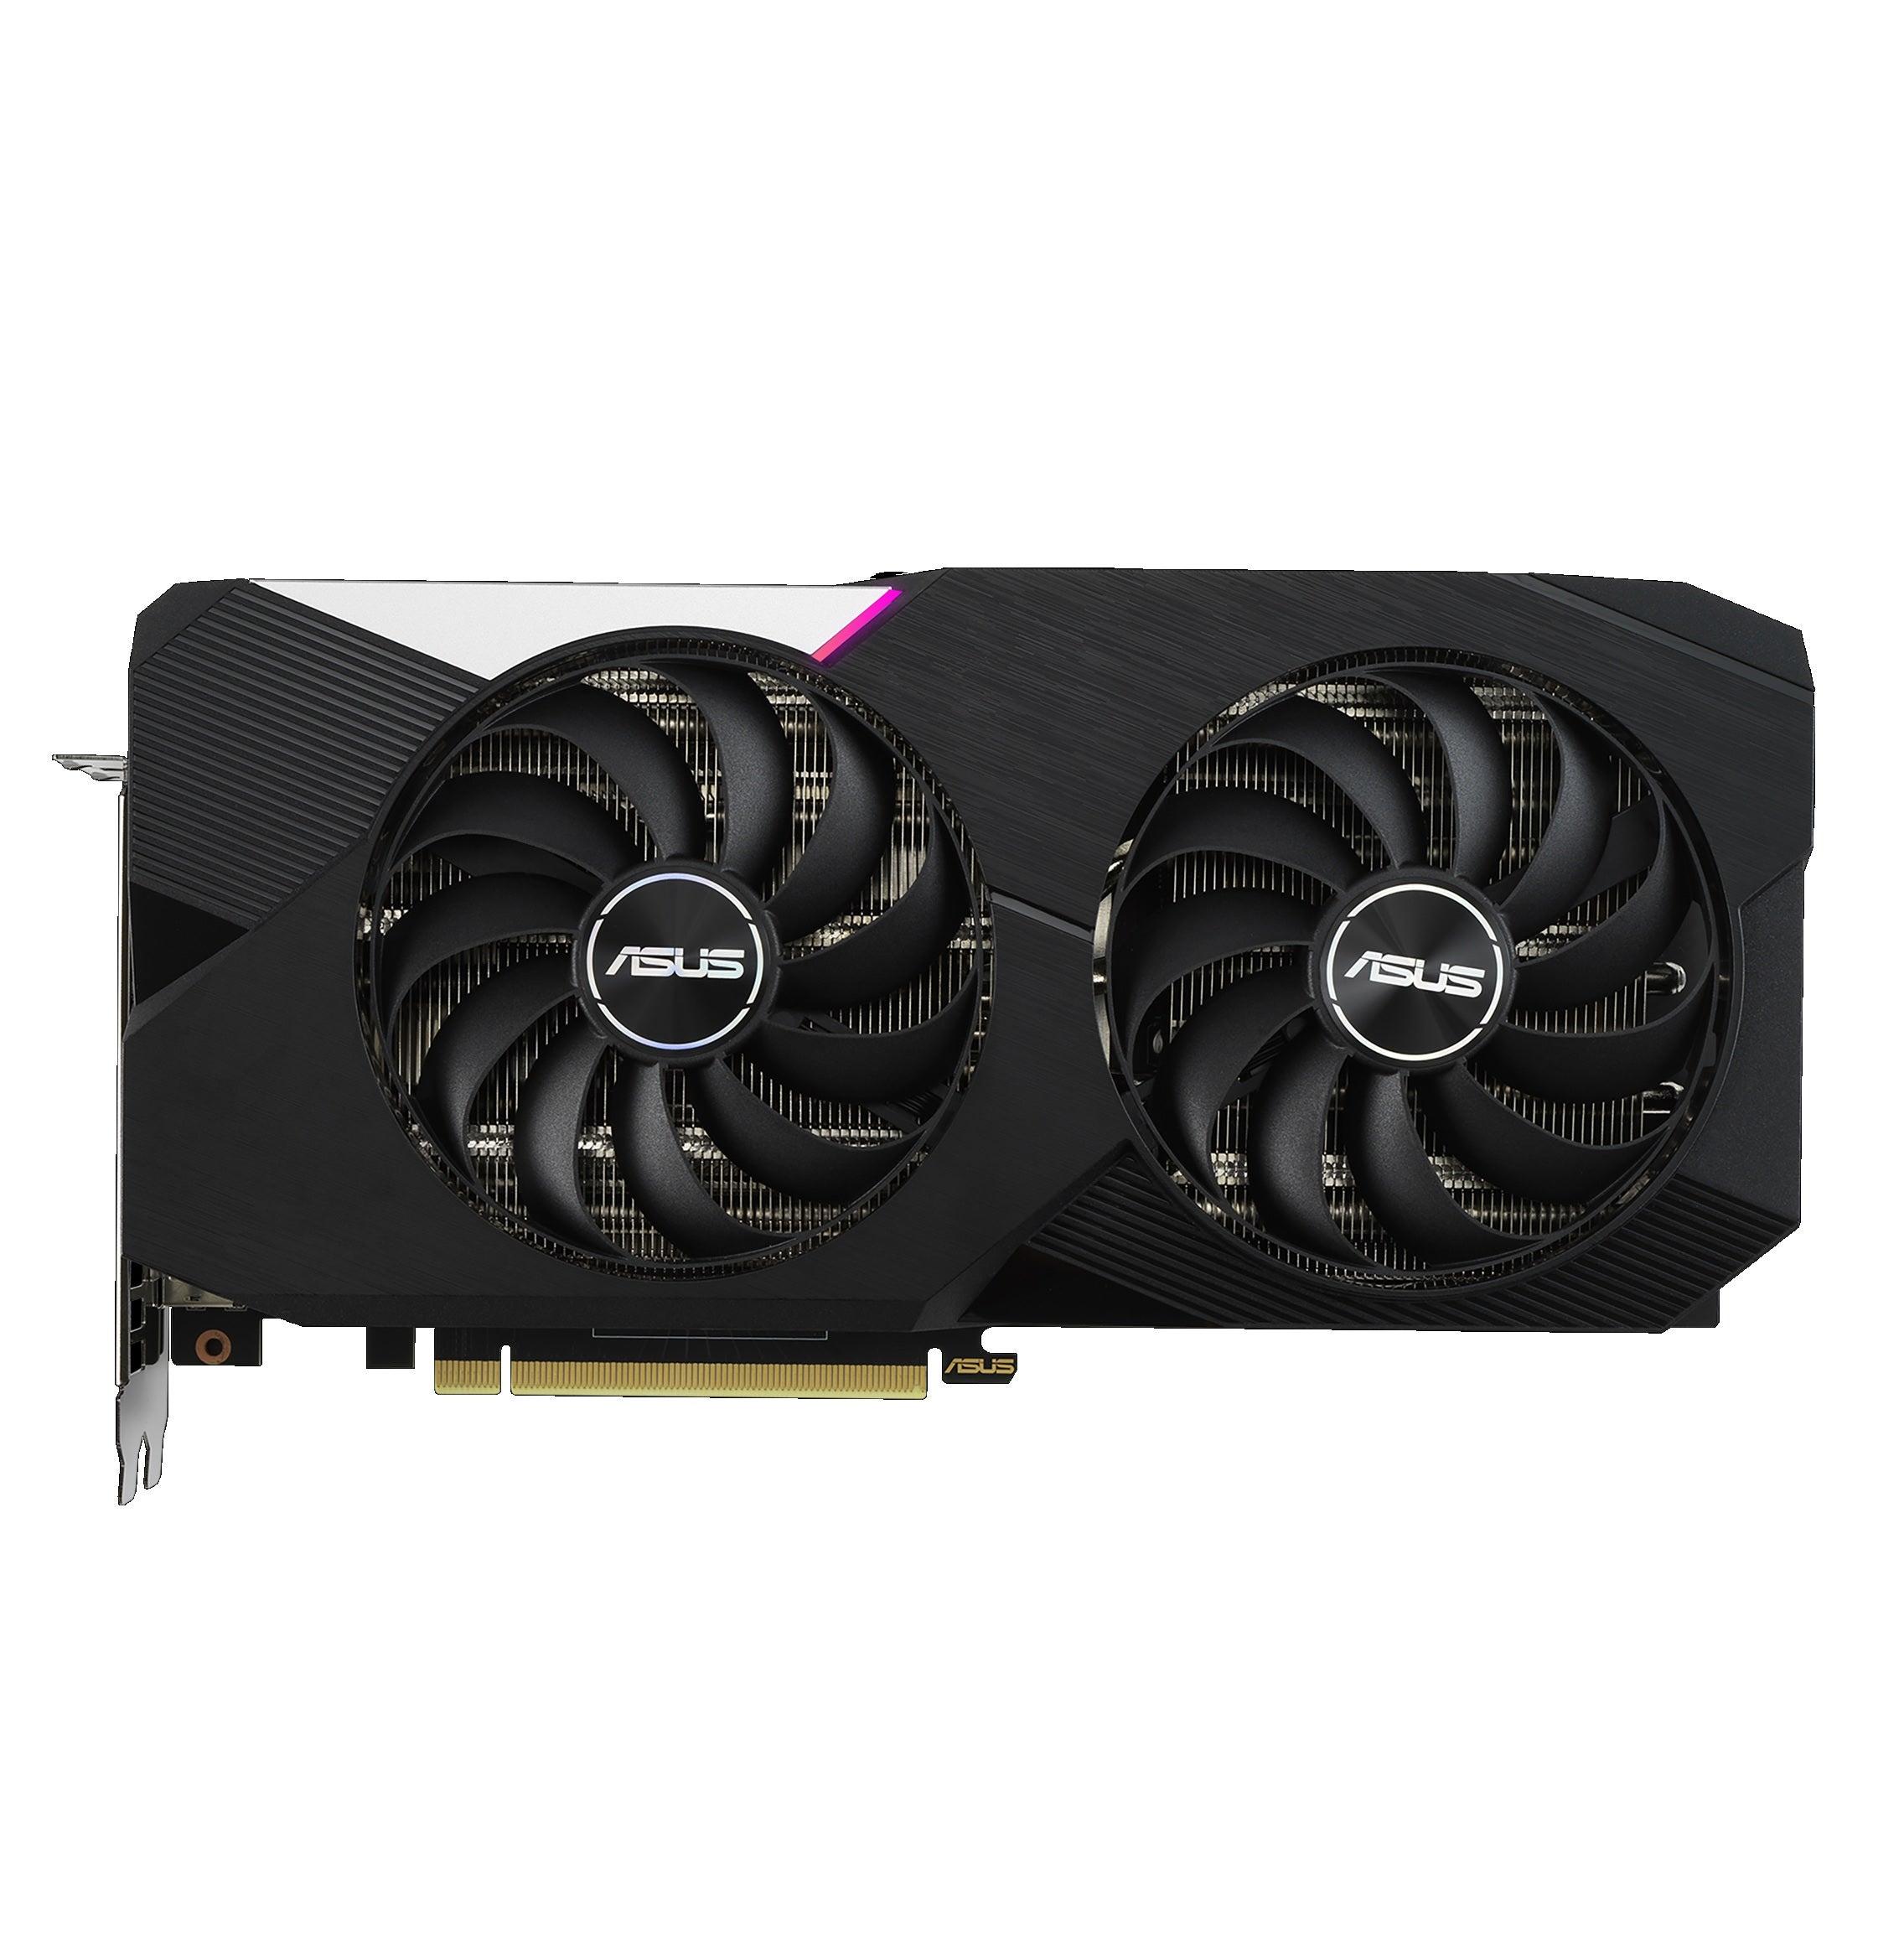 Asus Dual GeForce RTX 3060 Ti V2 OC Edition Graphics Card